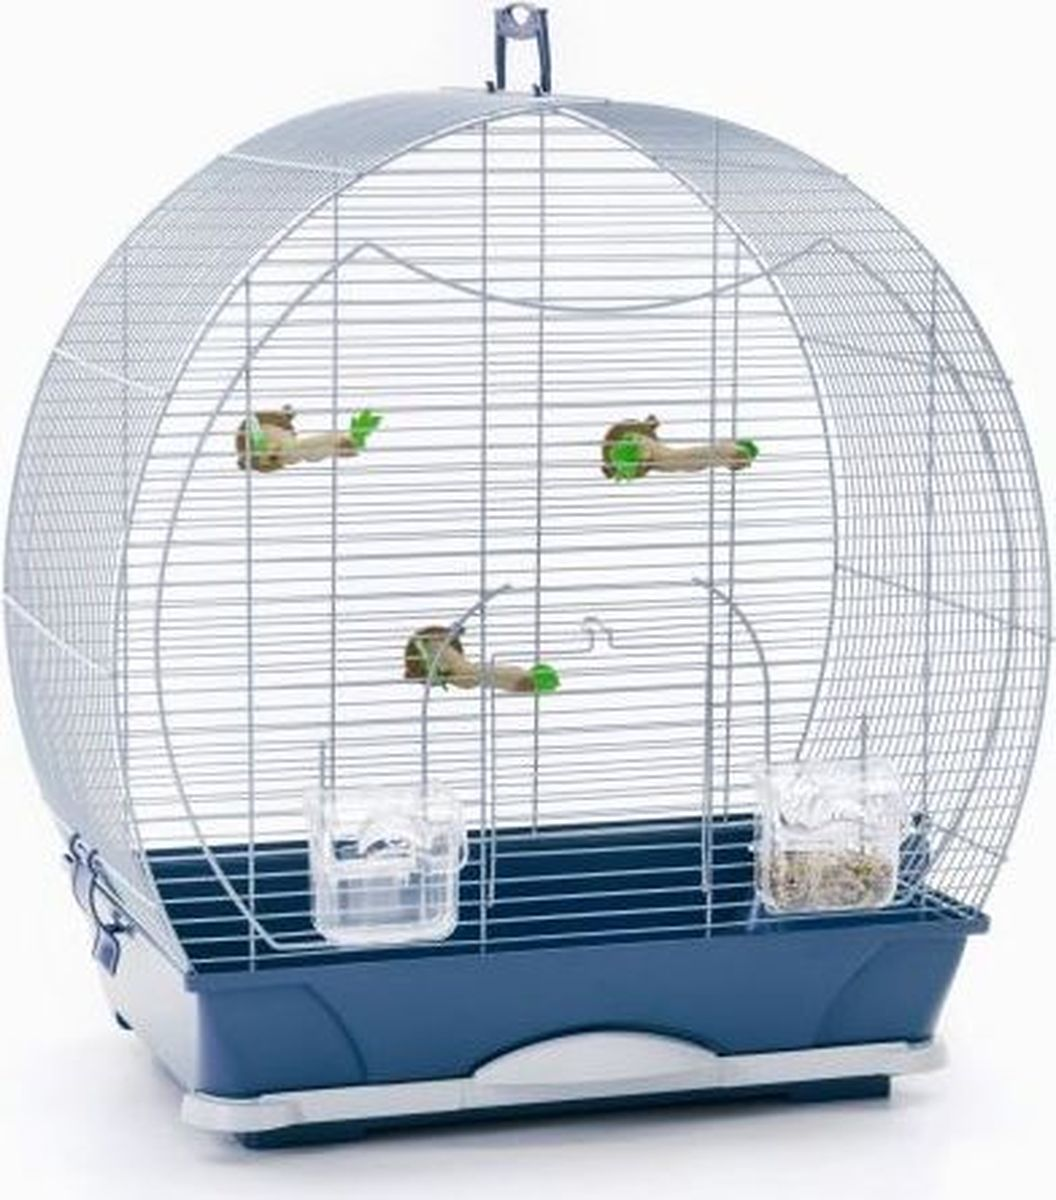 Клетка для птиц Savic Evelyne, цвет: серебристый, голубой, 52 х 32,5 х 55 см корм для птиц vitakraft menu vital для волнистых попугаев основной 1кг